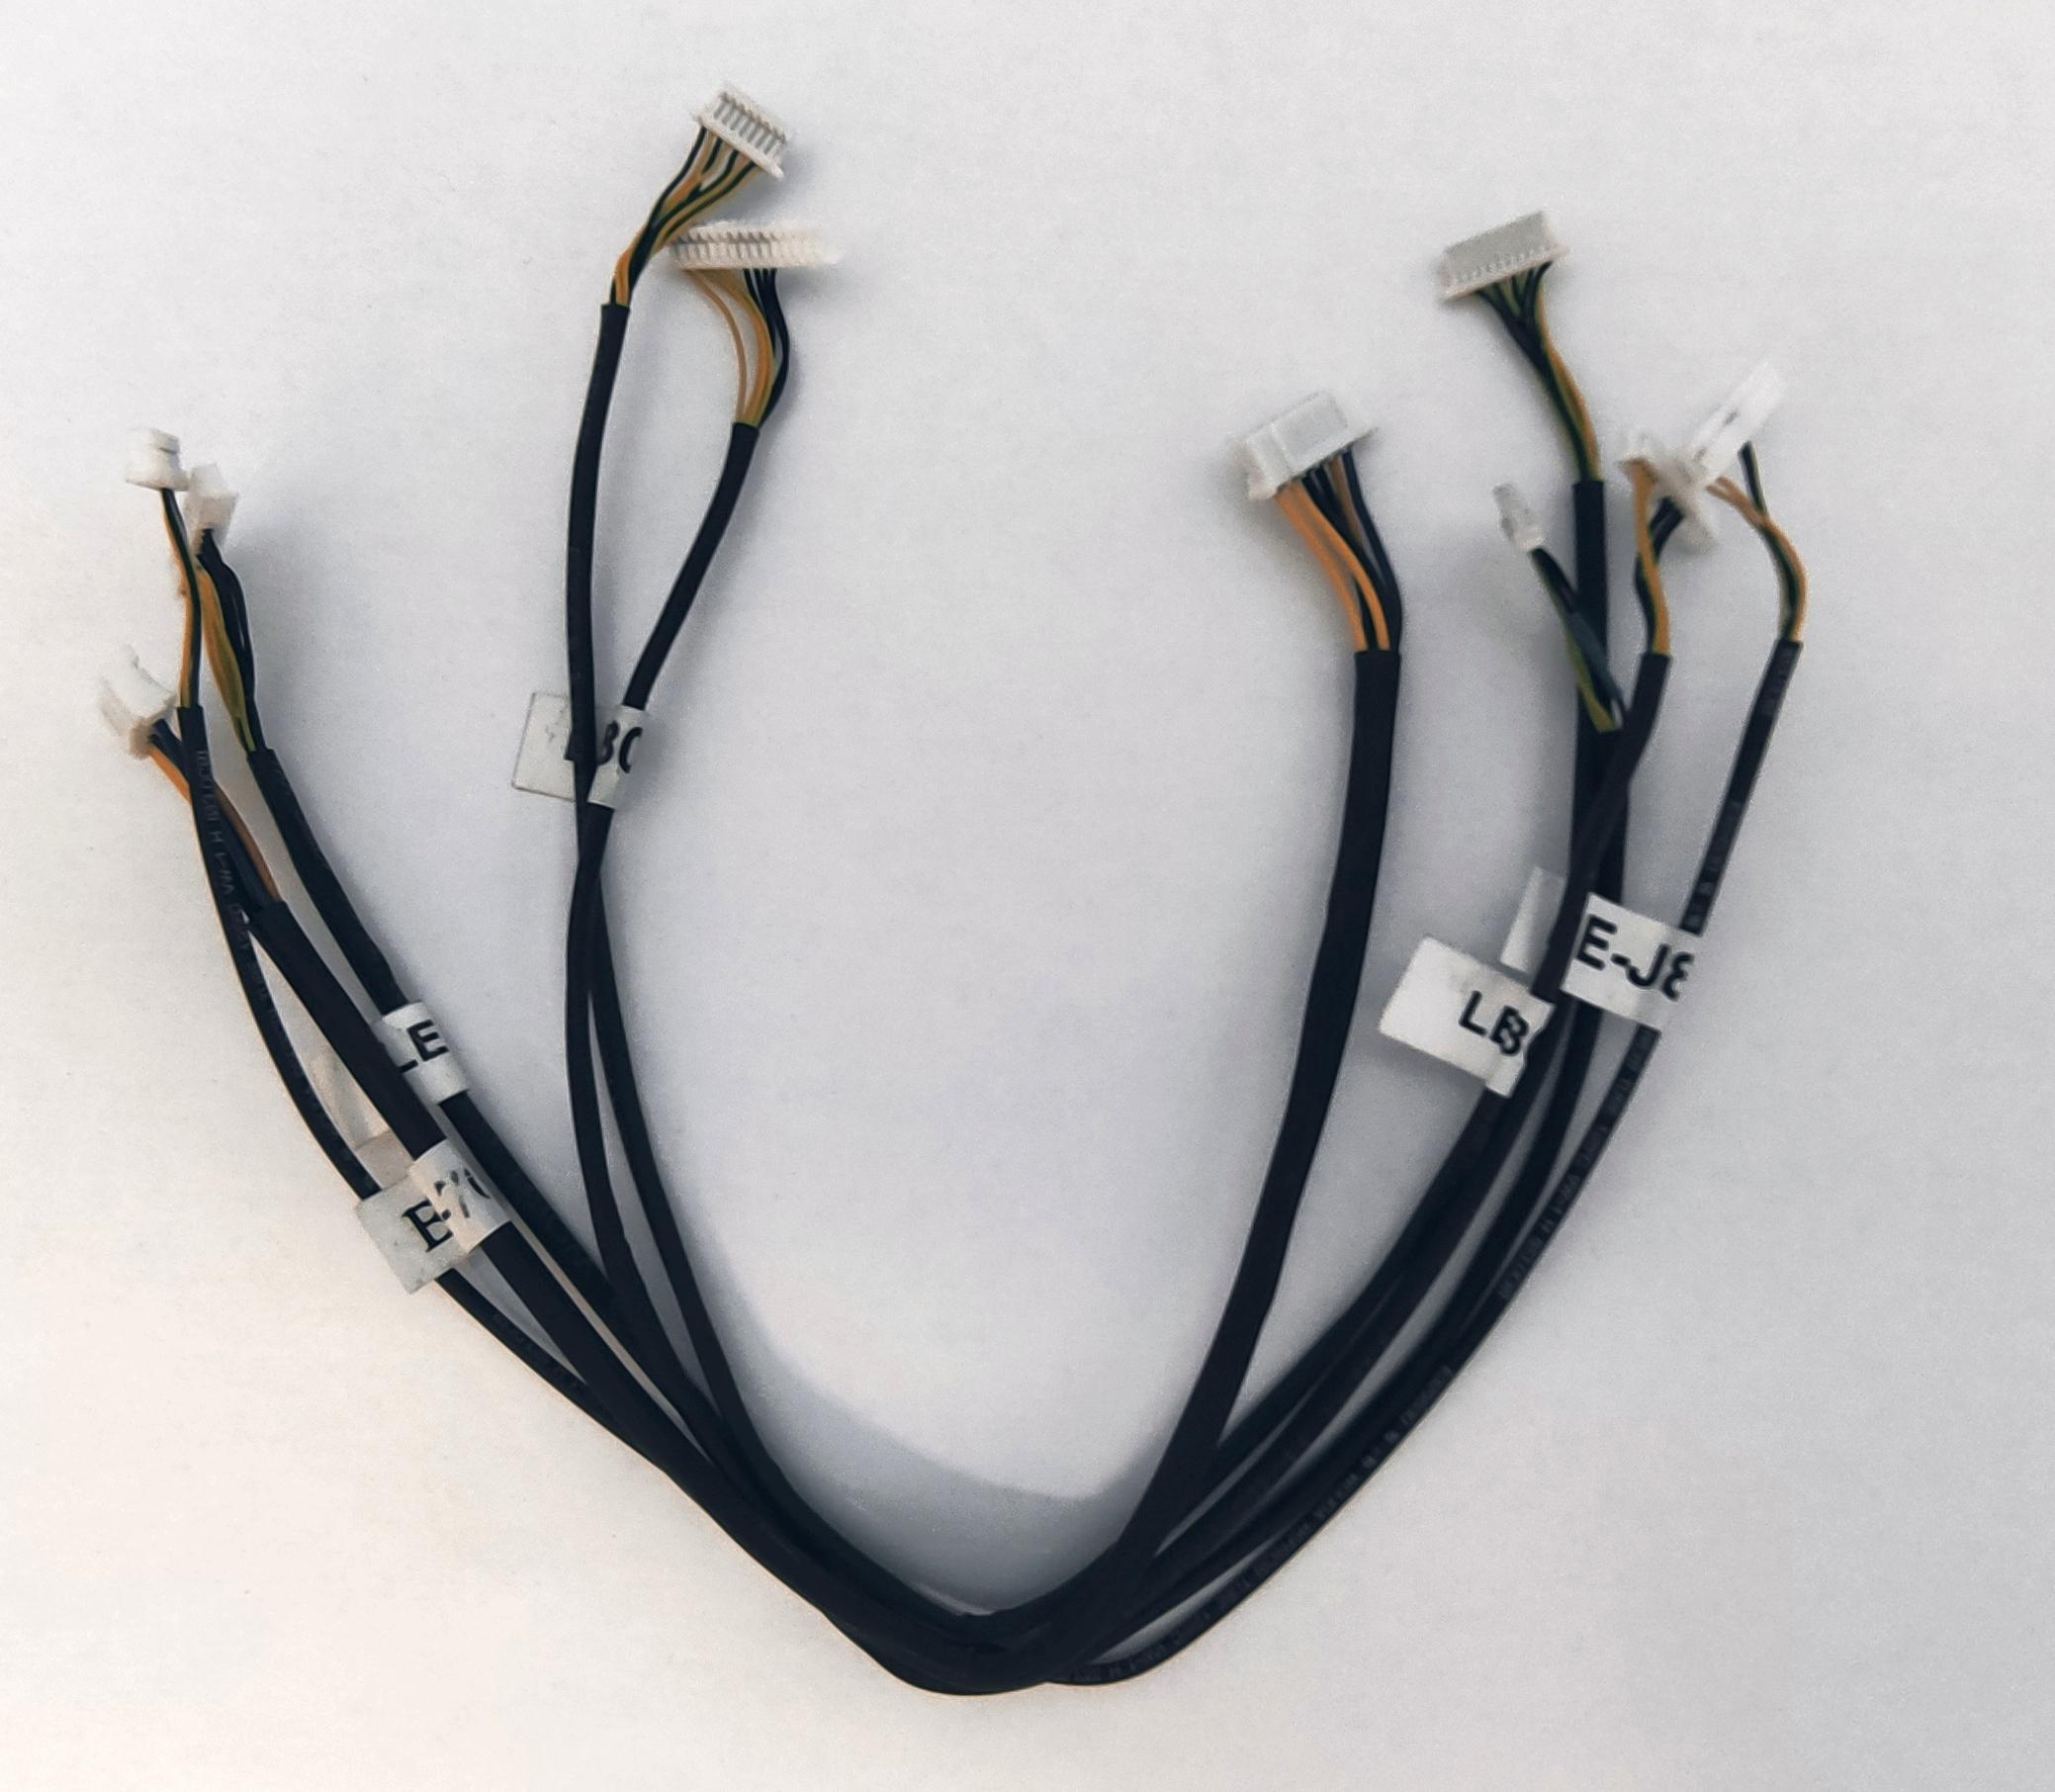 LE-cable-C80637